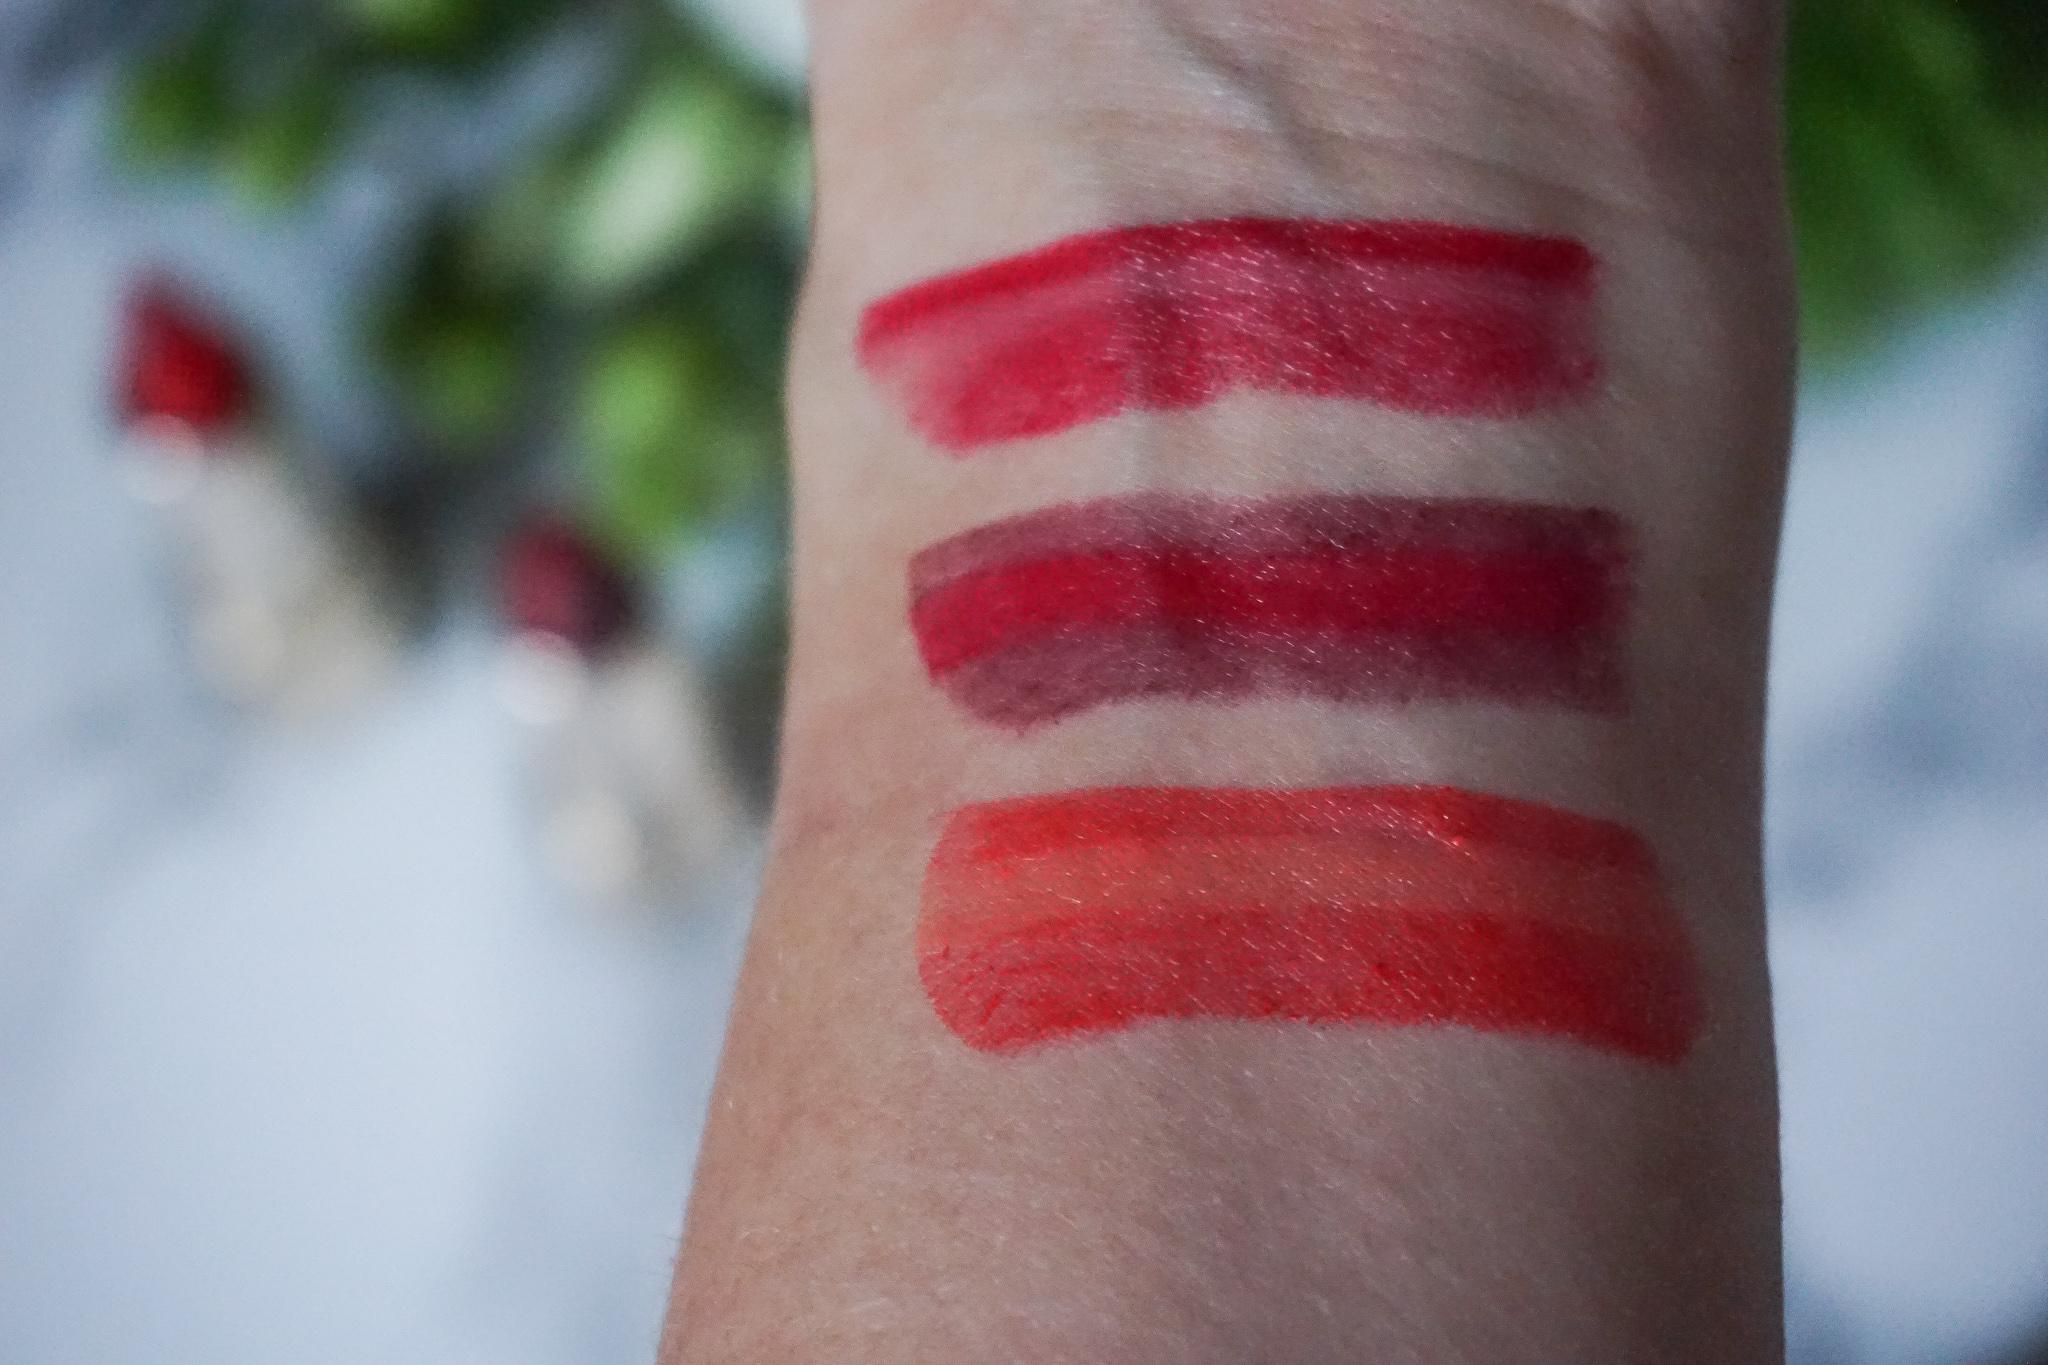 Clarins Jolie Rouge Gradation Lippenstifte Review